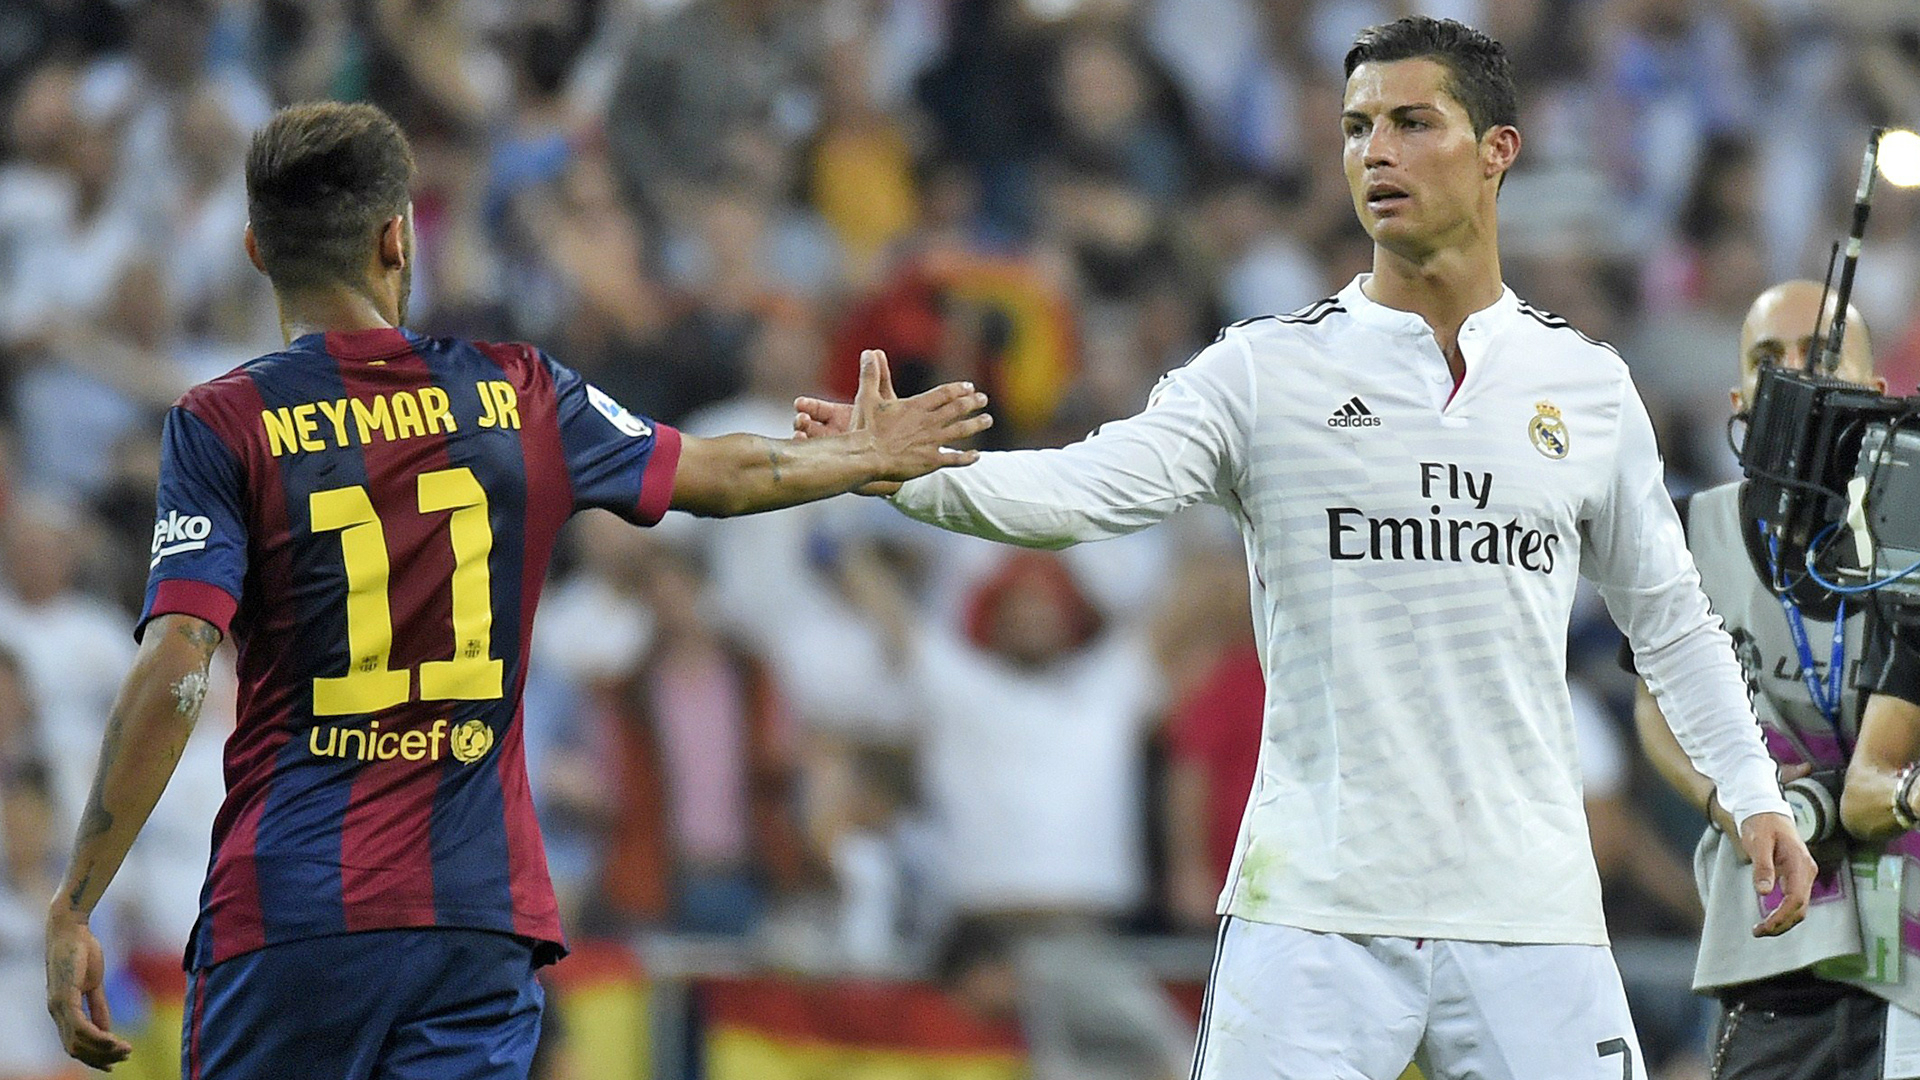 cf4f472fcb42 Magical Display of Skills - Cristiano Ronaldo vs Neymar Jr  Video